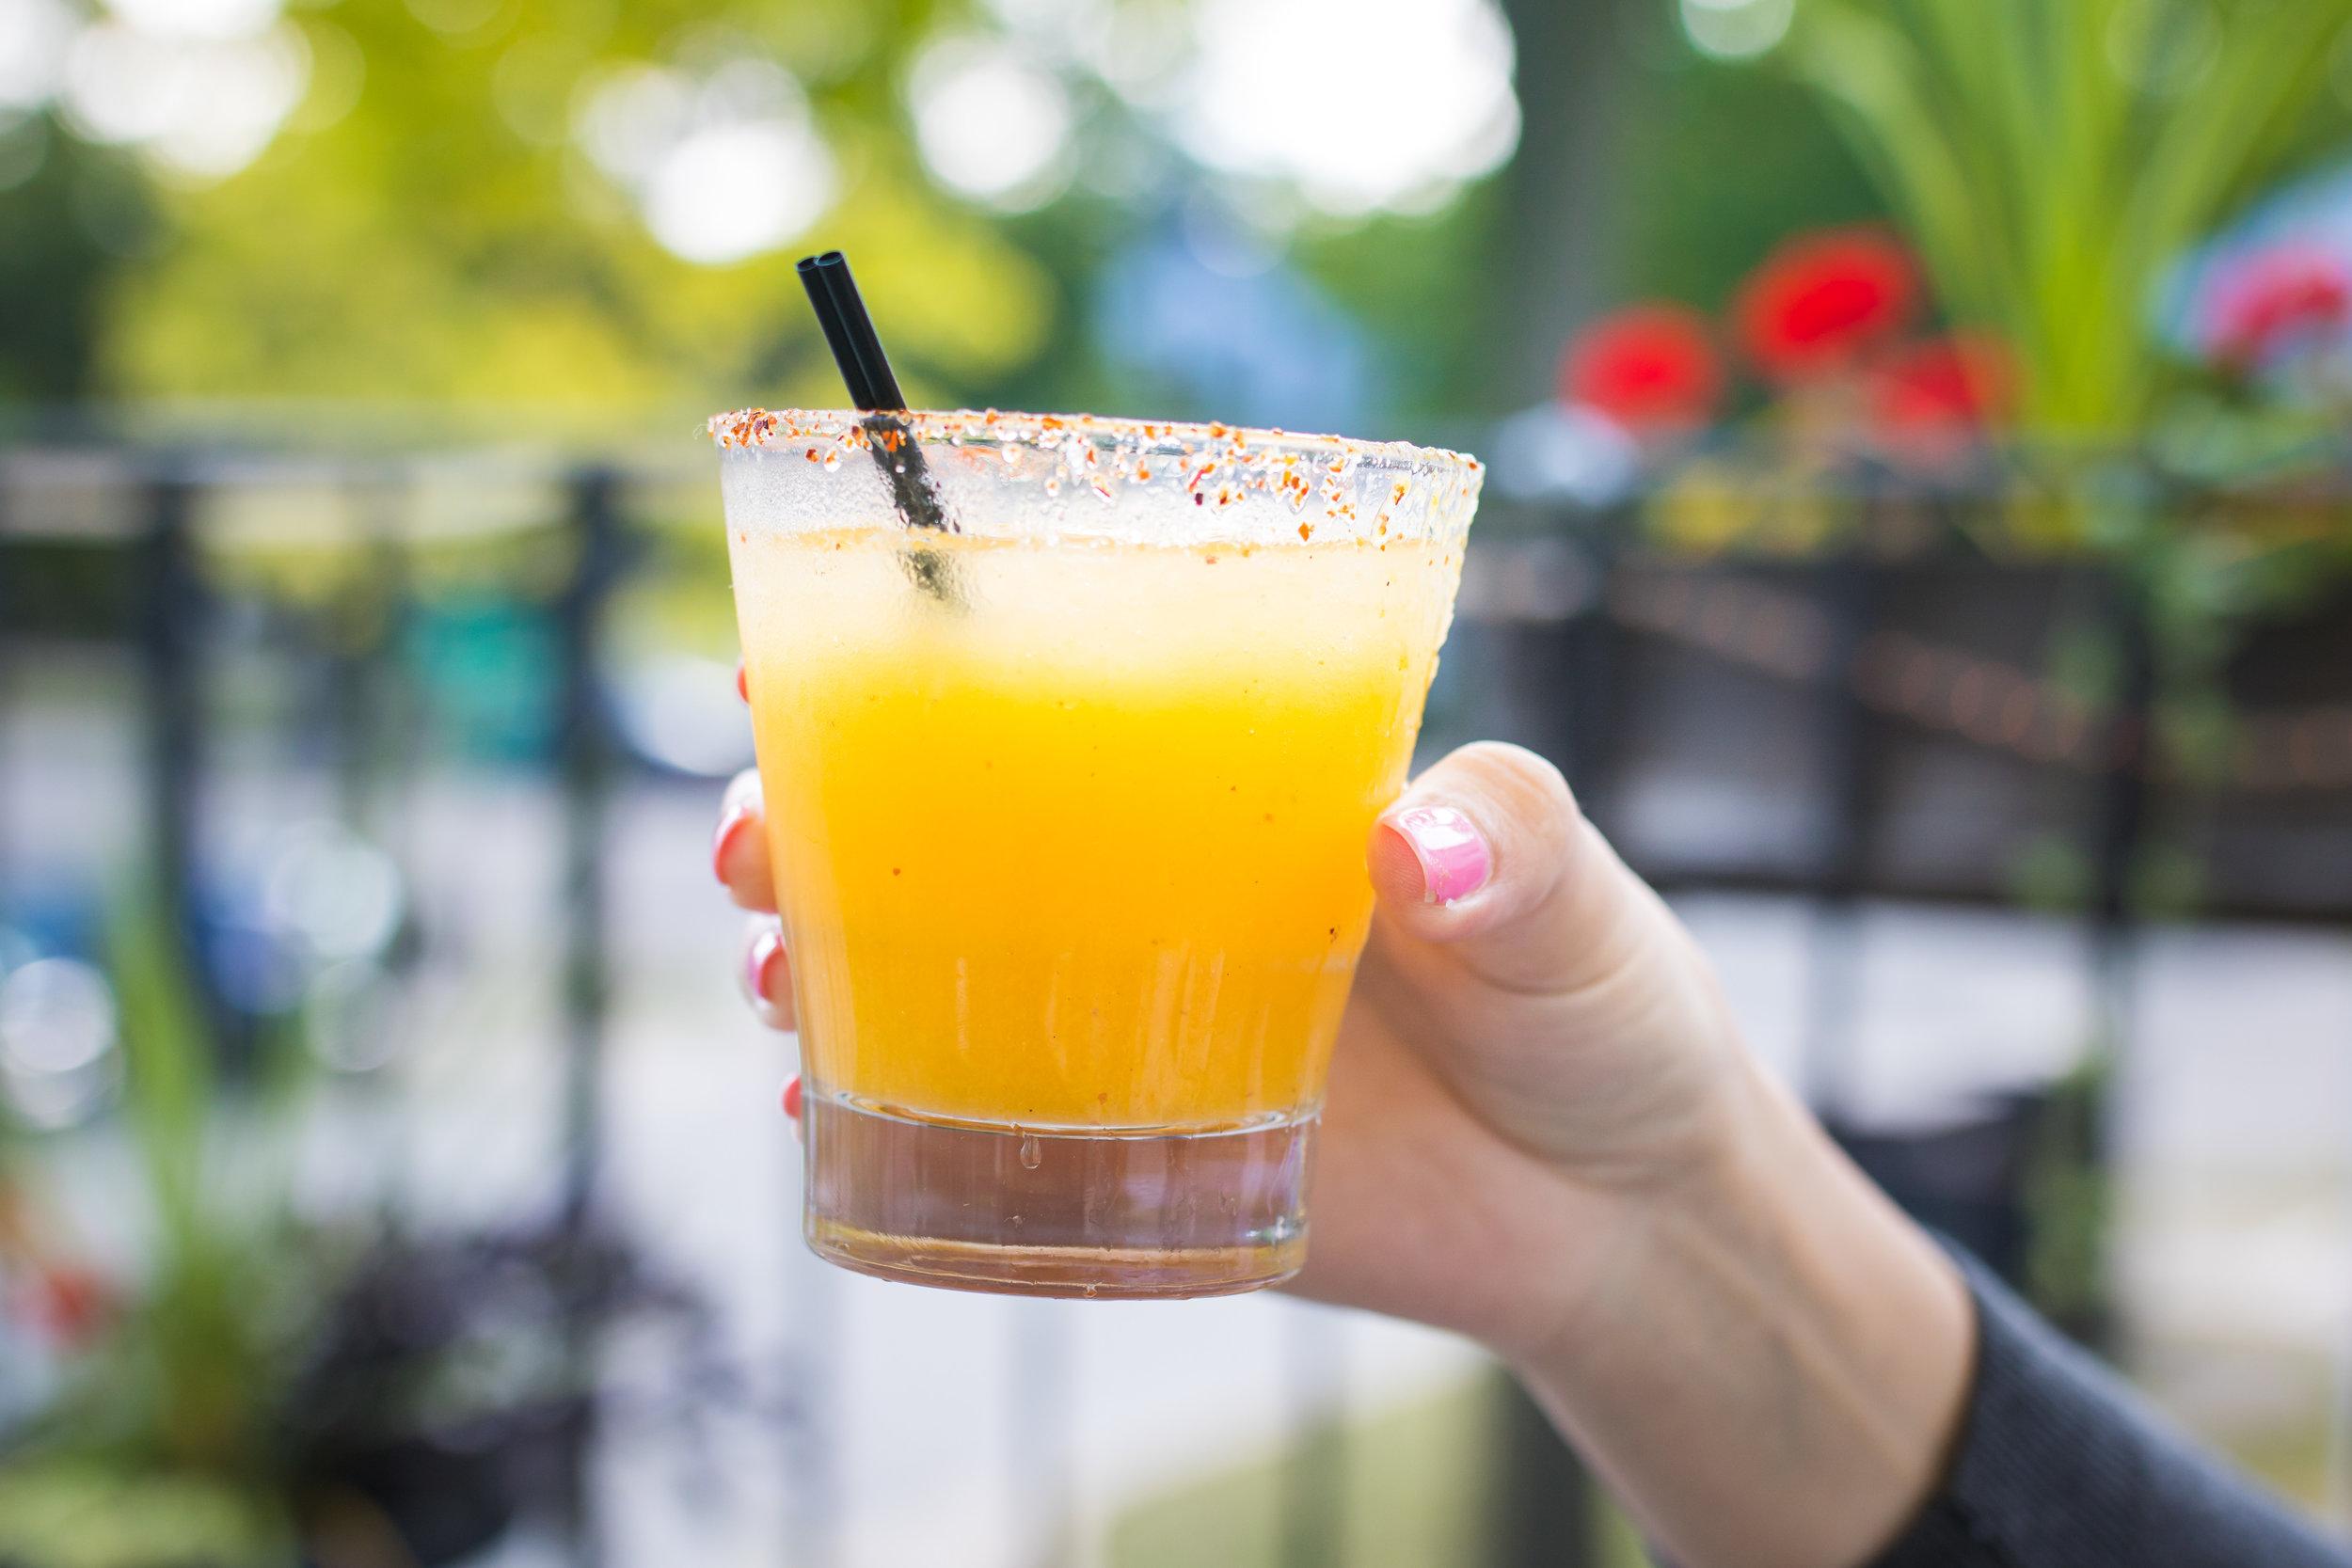 Mango margarita: fresh muddle lime, mango, orange liquor, organic agave nector. El Mayor reposado, and tajin.